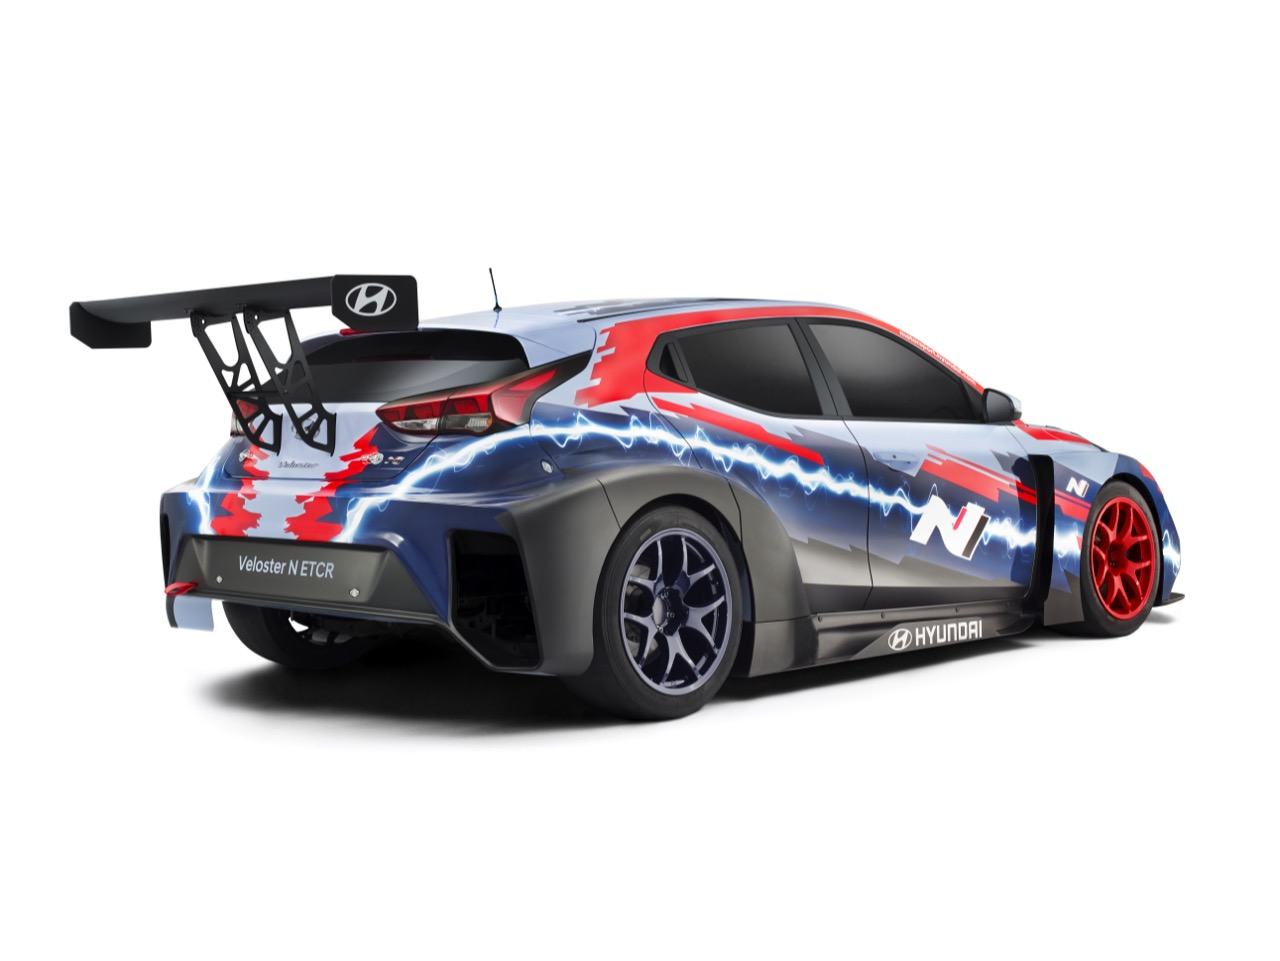 Hyundai Motorsport Veloster N ETCR - foto